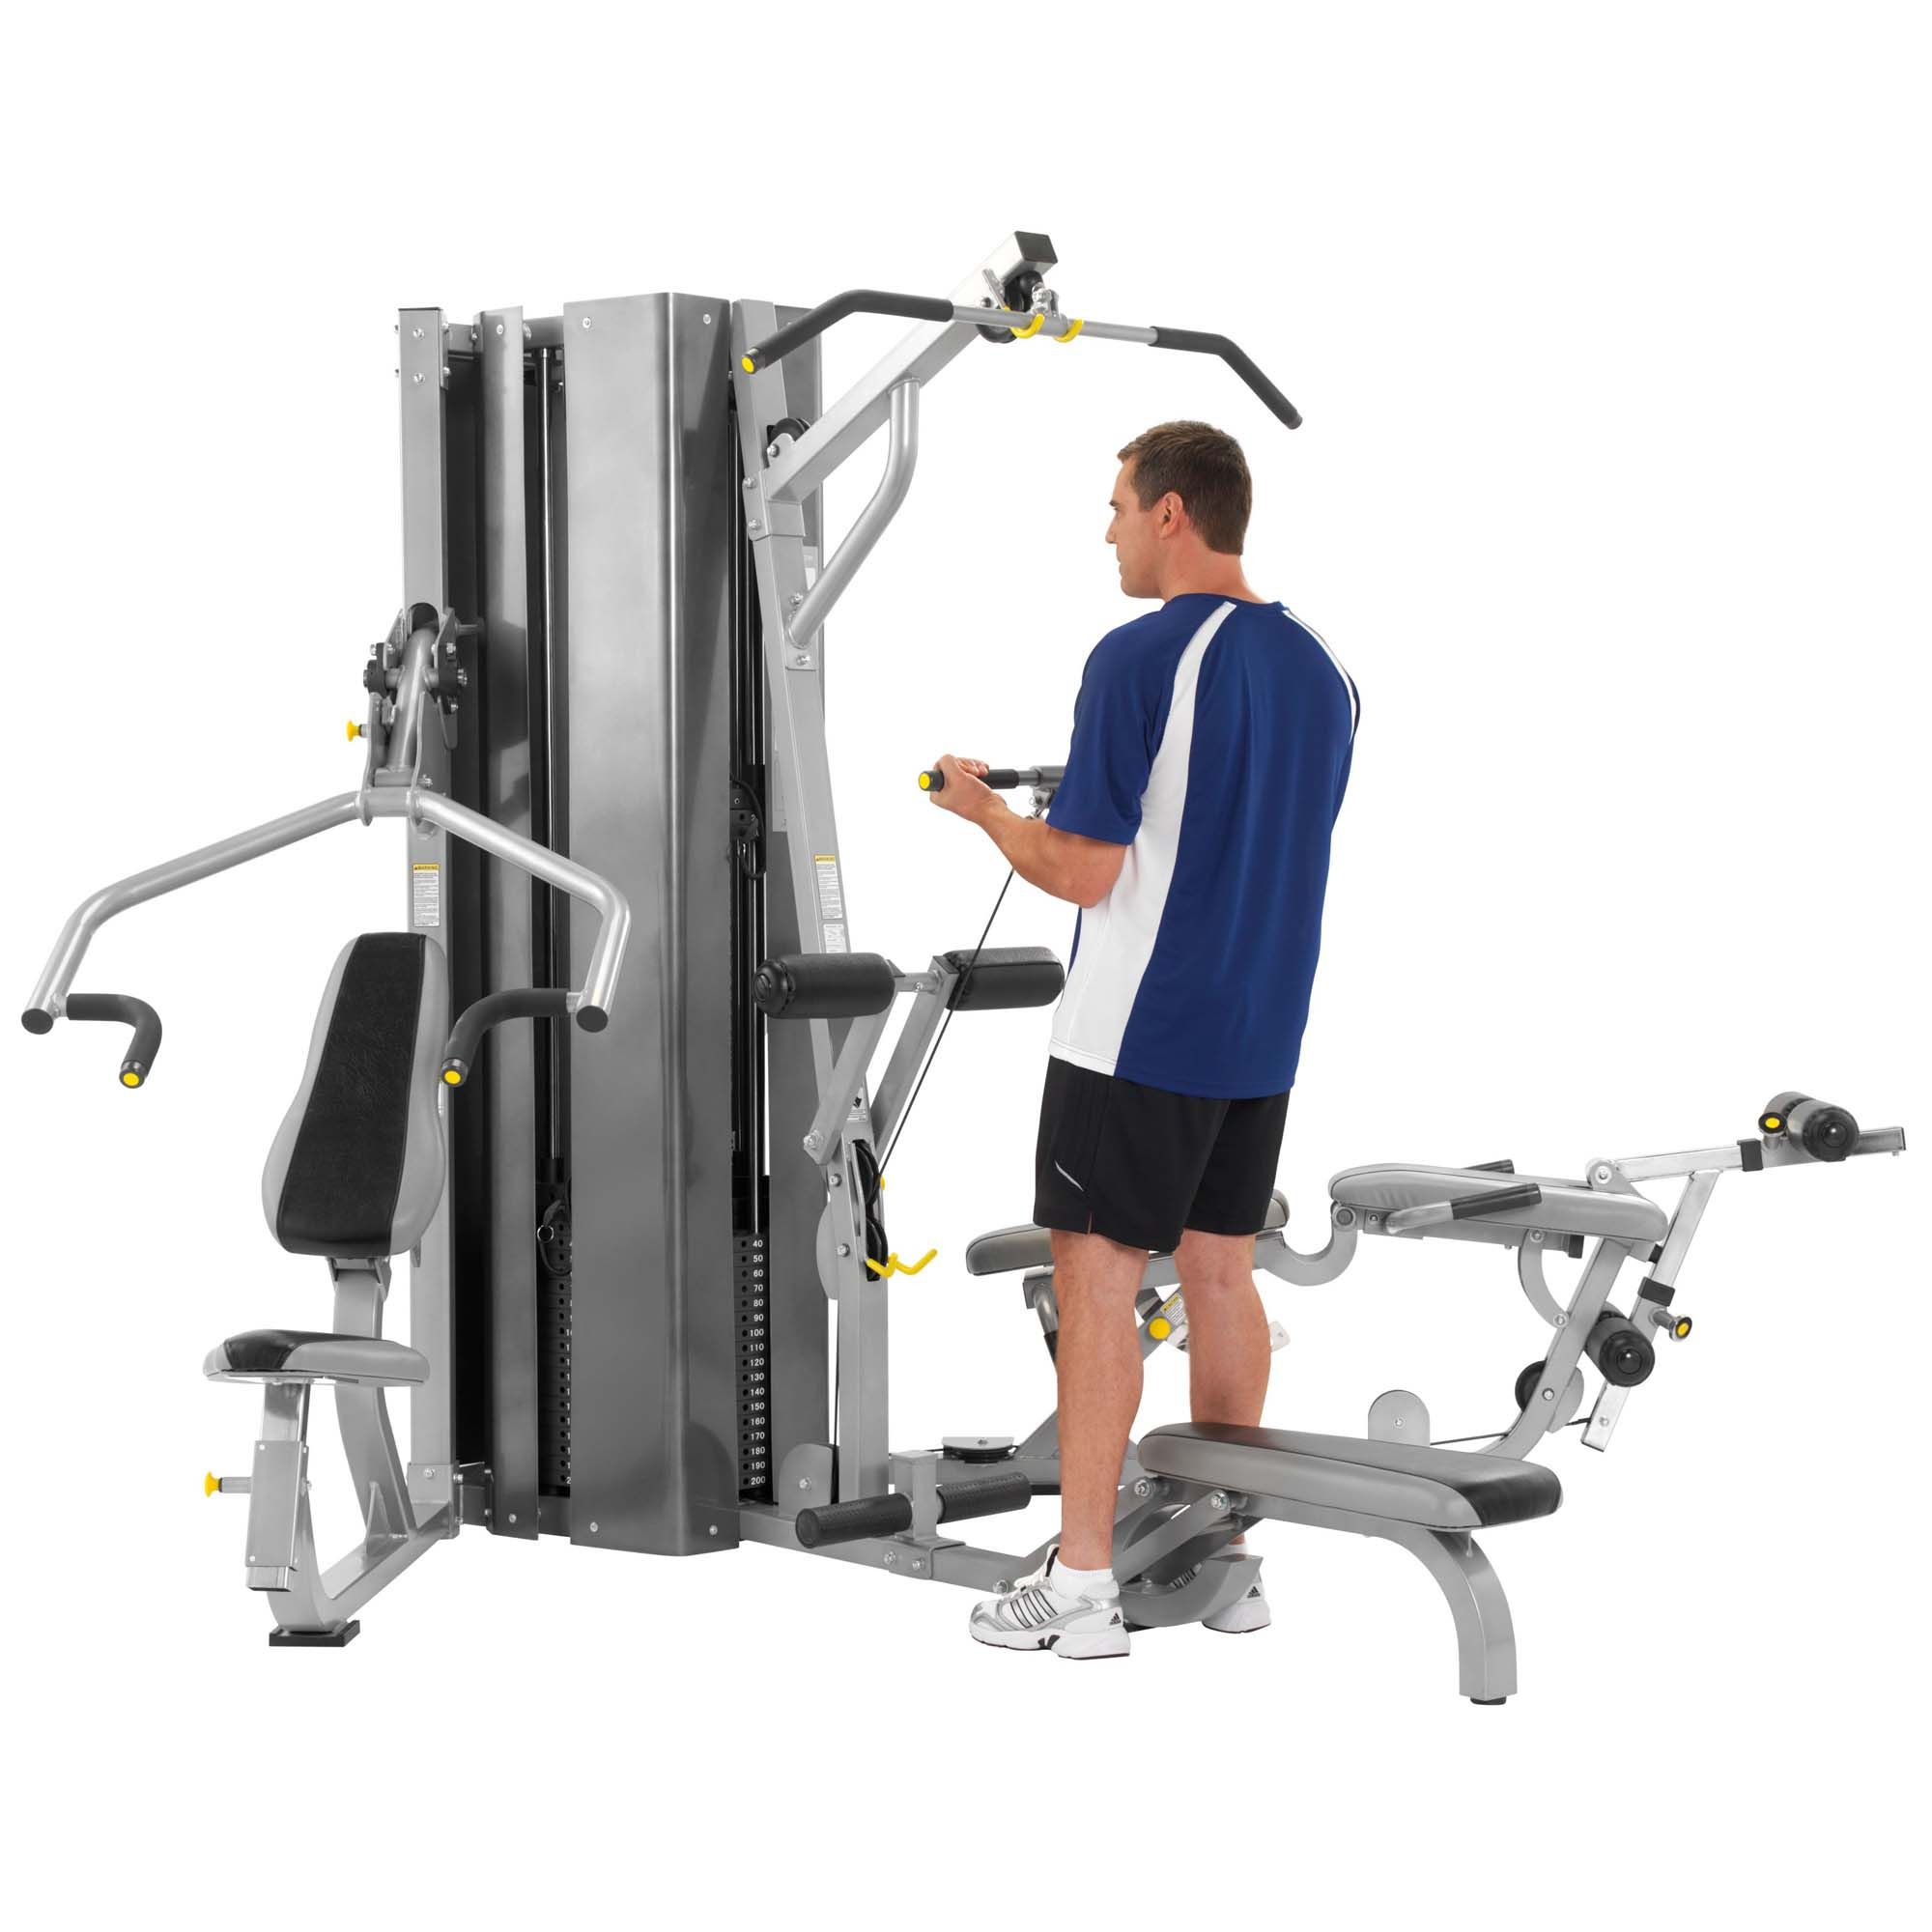 Cybex Mg 525 3 Stack Multi Gym